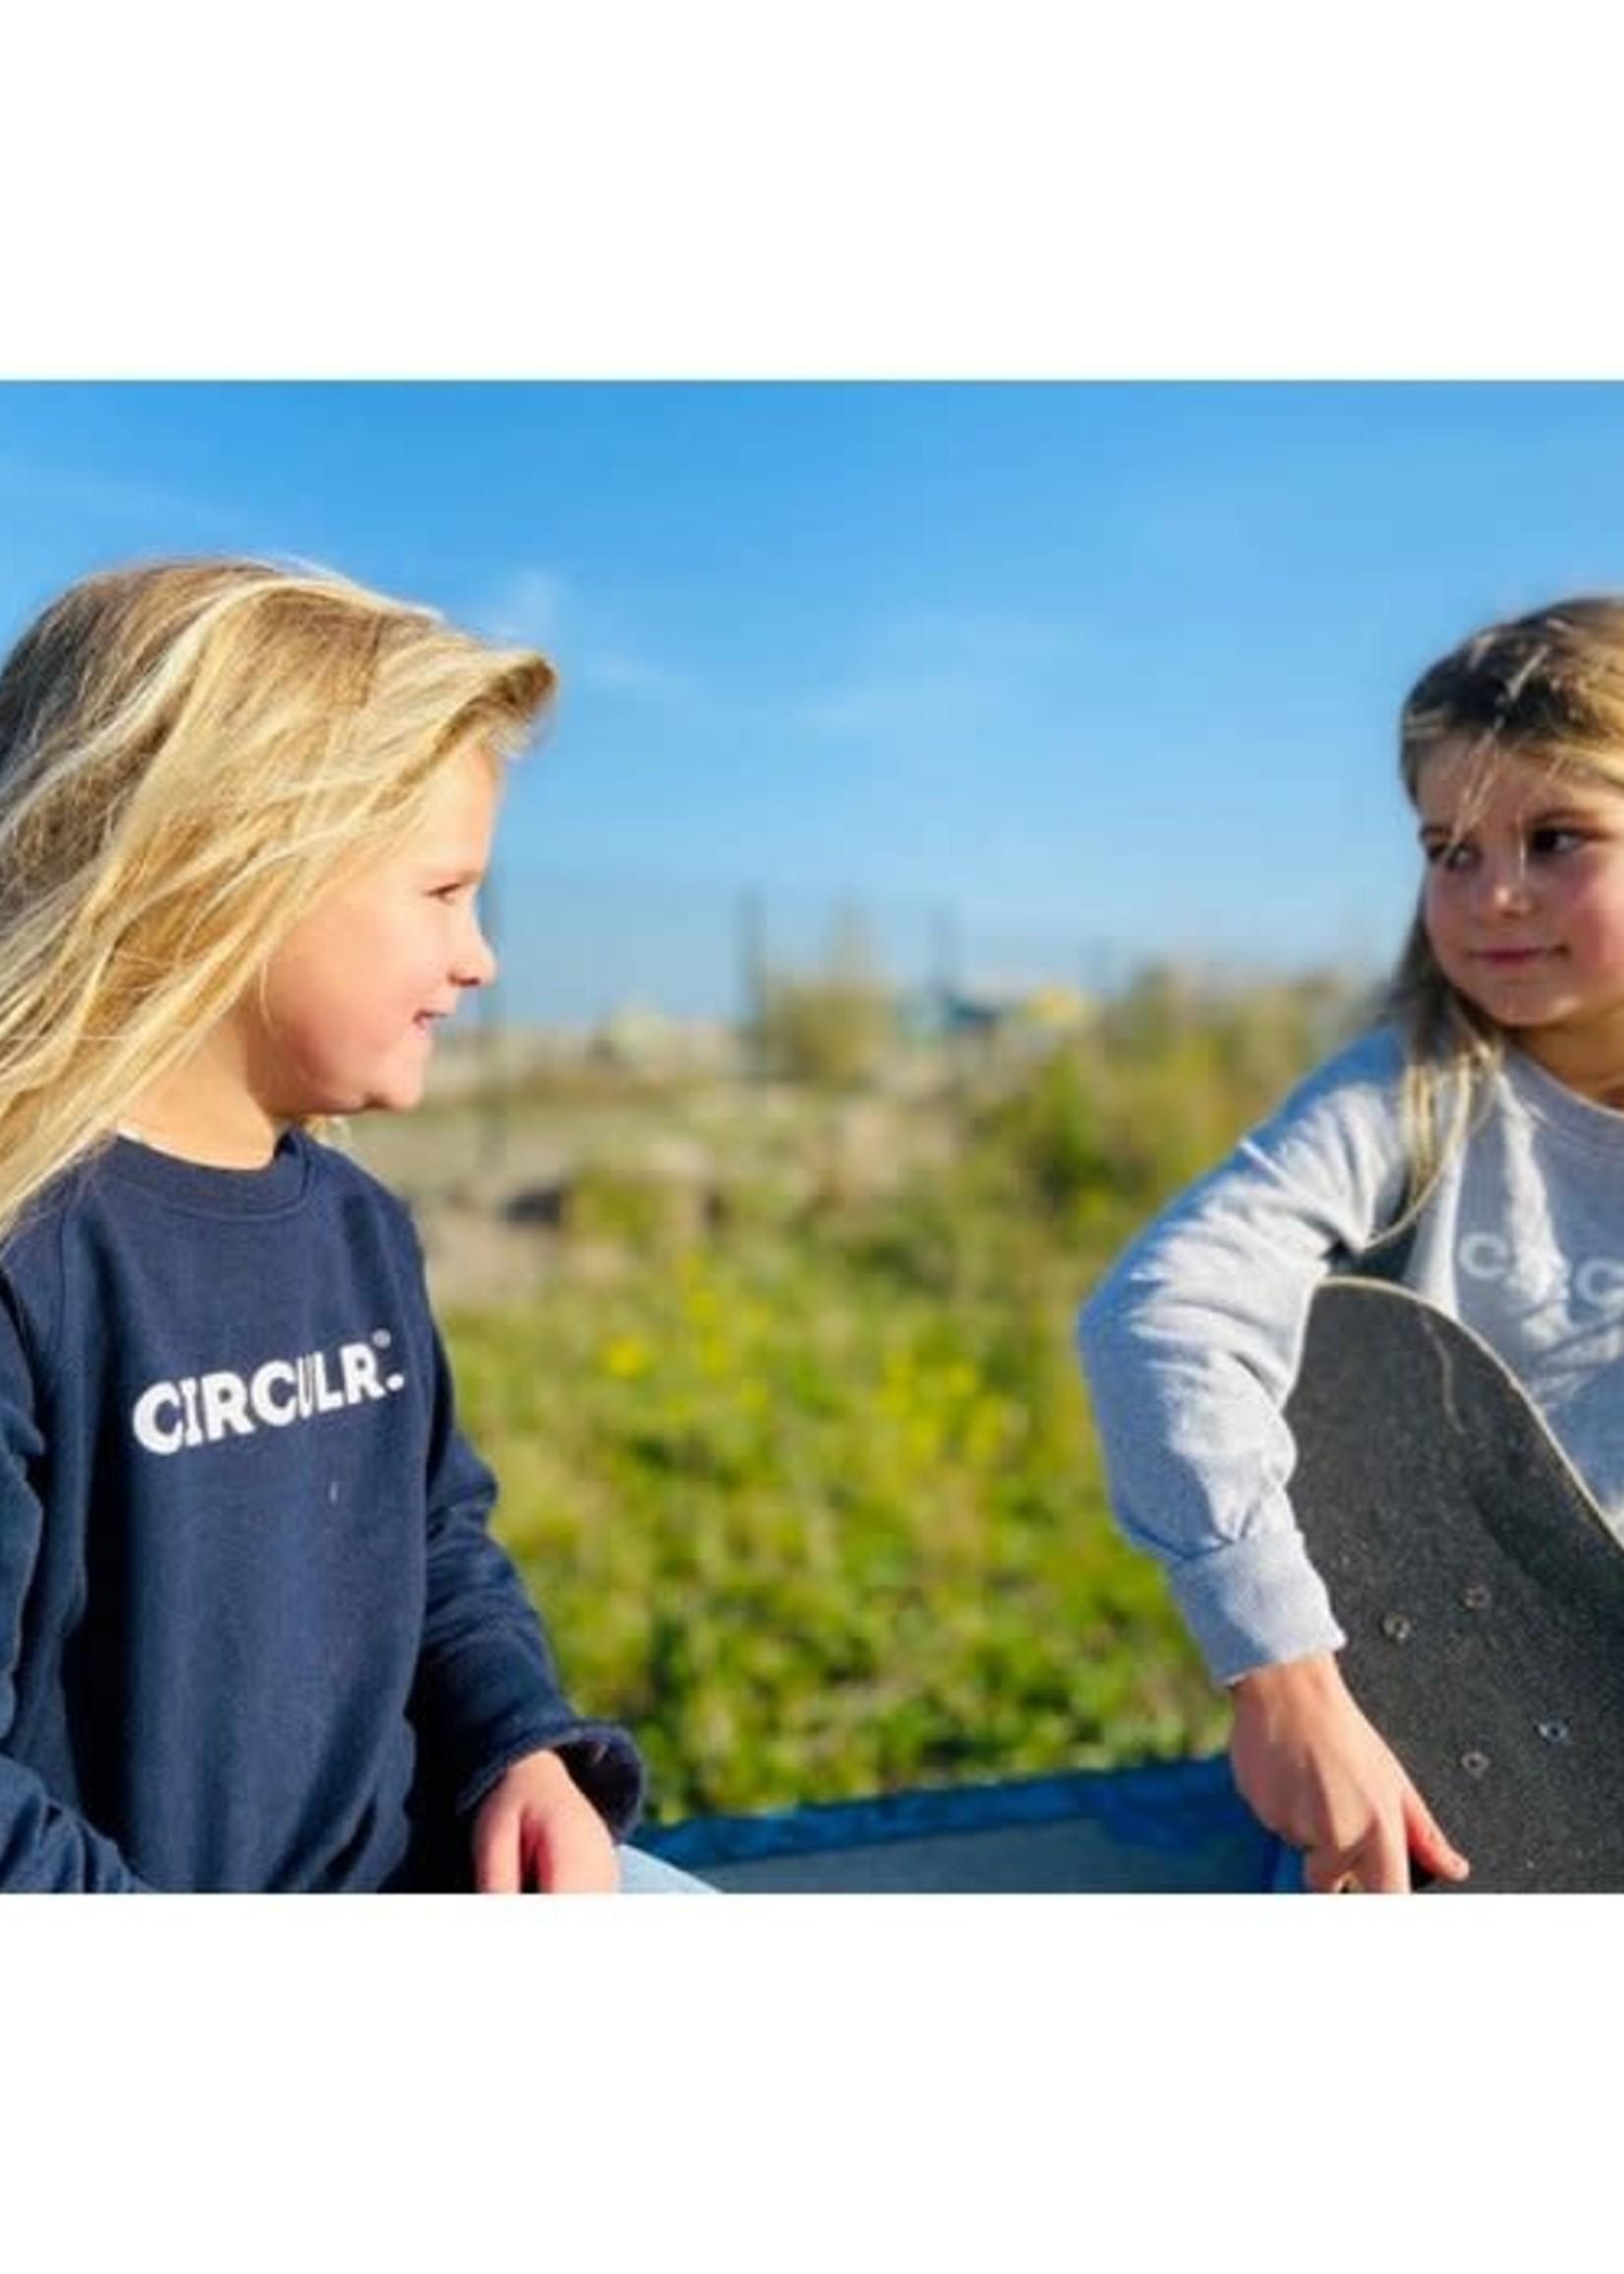 Woodlane CIRCULR. Sweater Kids Navy (unisex)